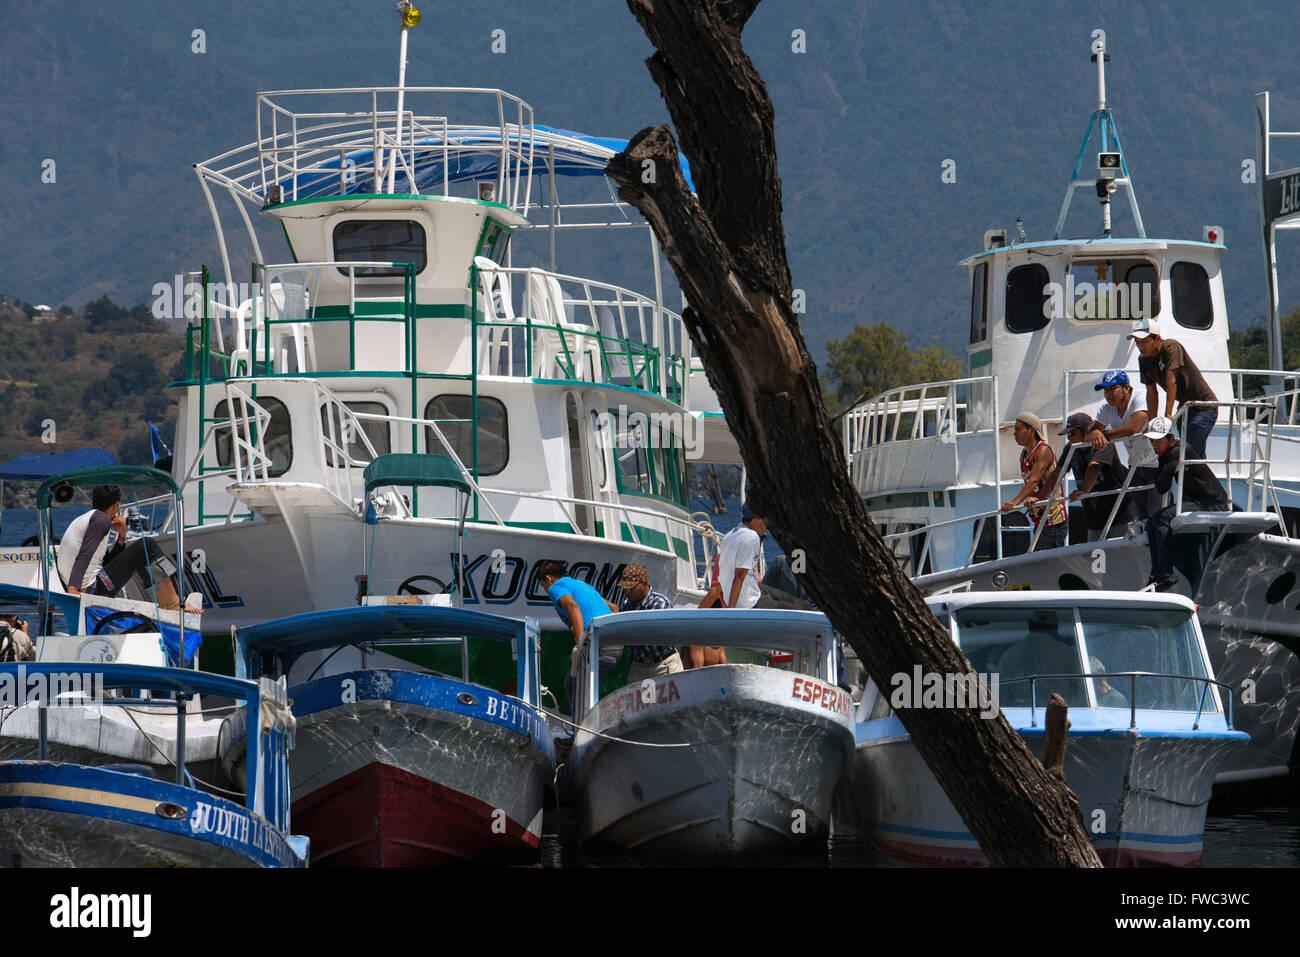 Boats in the dock of Santiago Atitlan, Lake Atitlan, Guatemala, Central America. Stock Photo